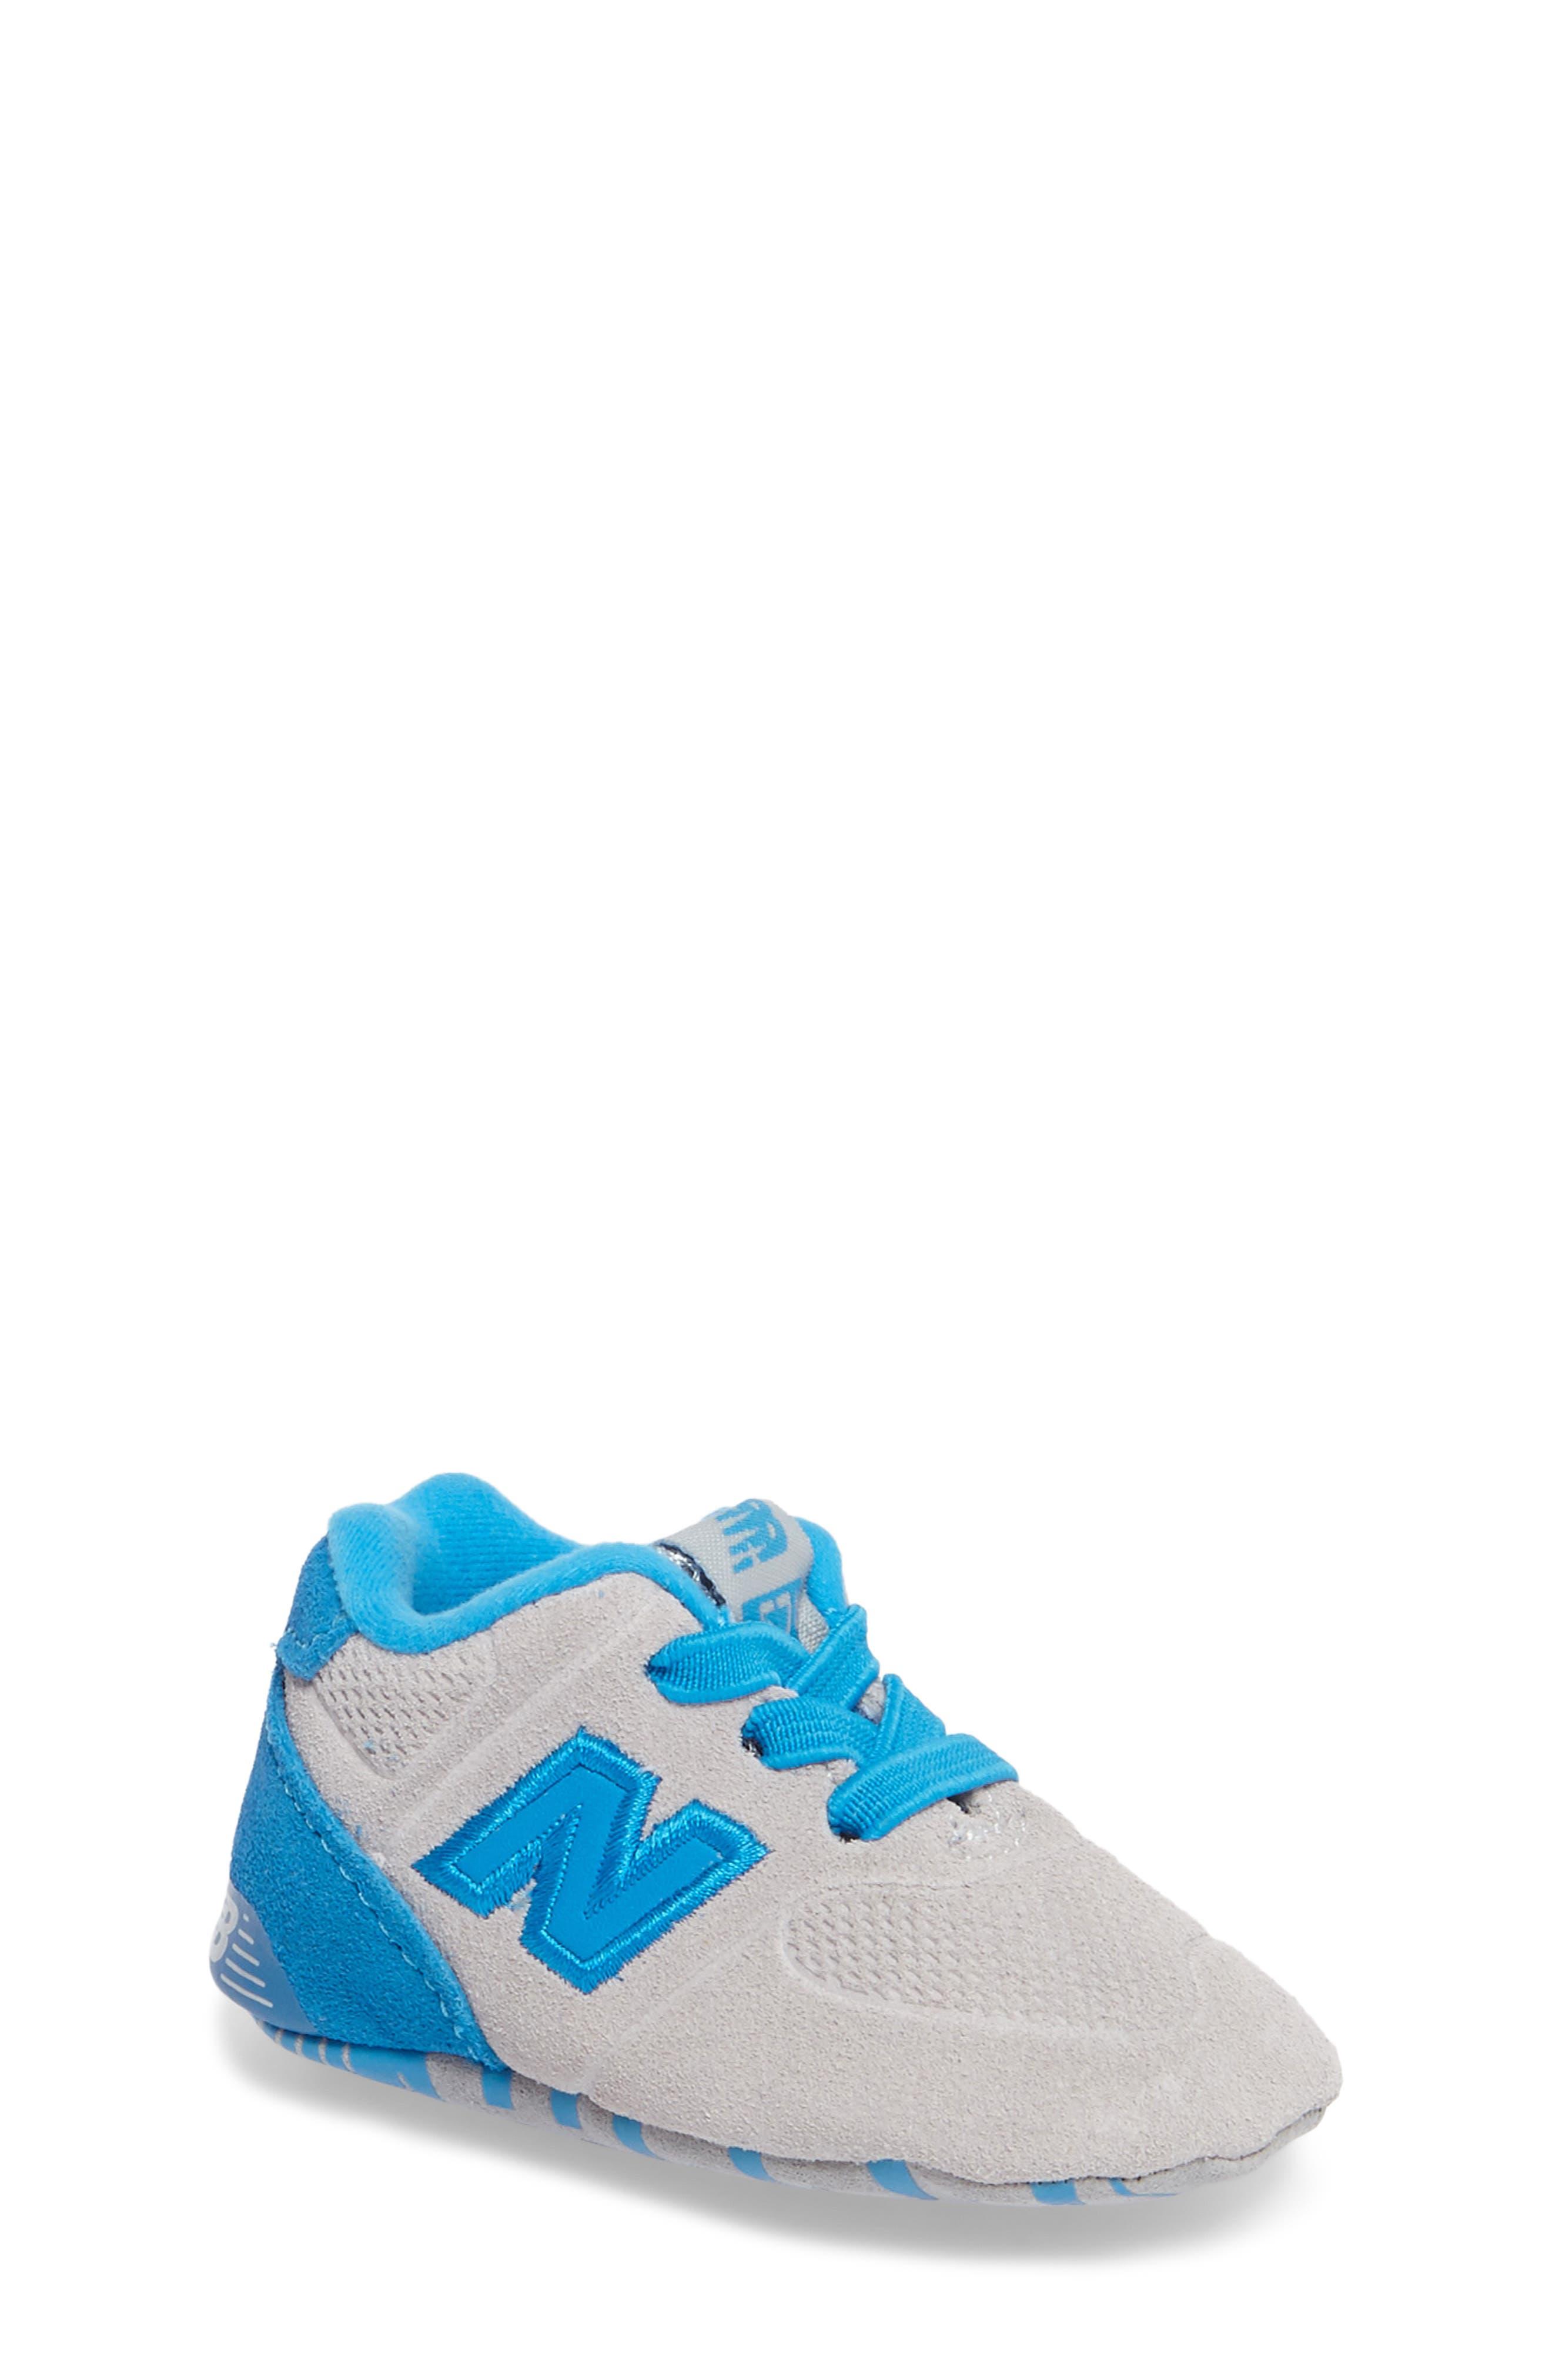 Main Image - New Balance 547 Crib Shoe (Baby)